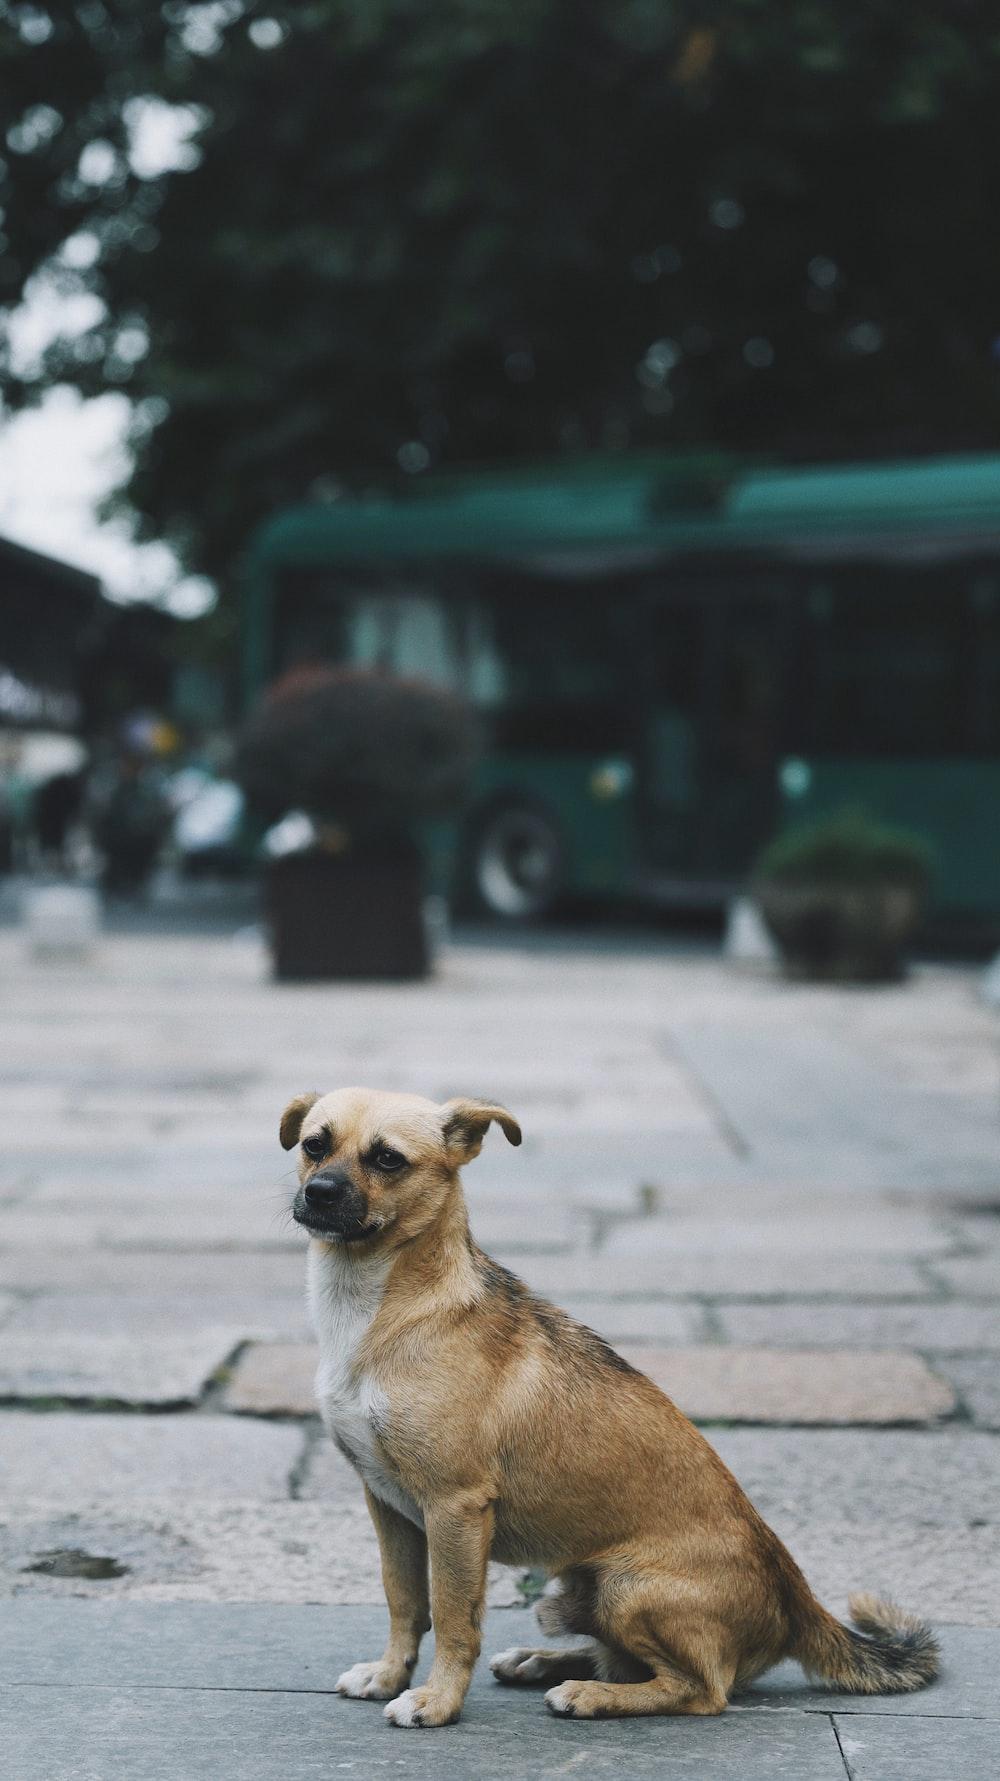 brown dog on floor during daytime